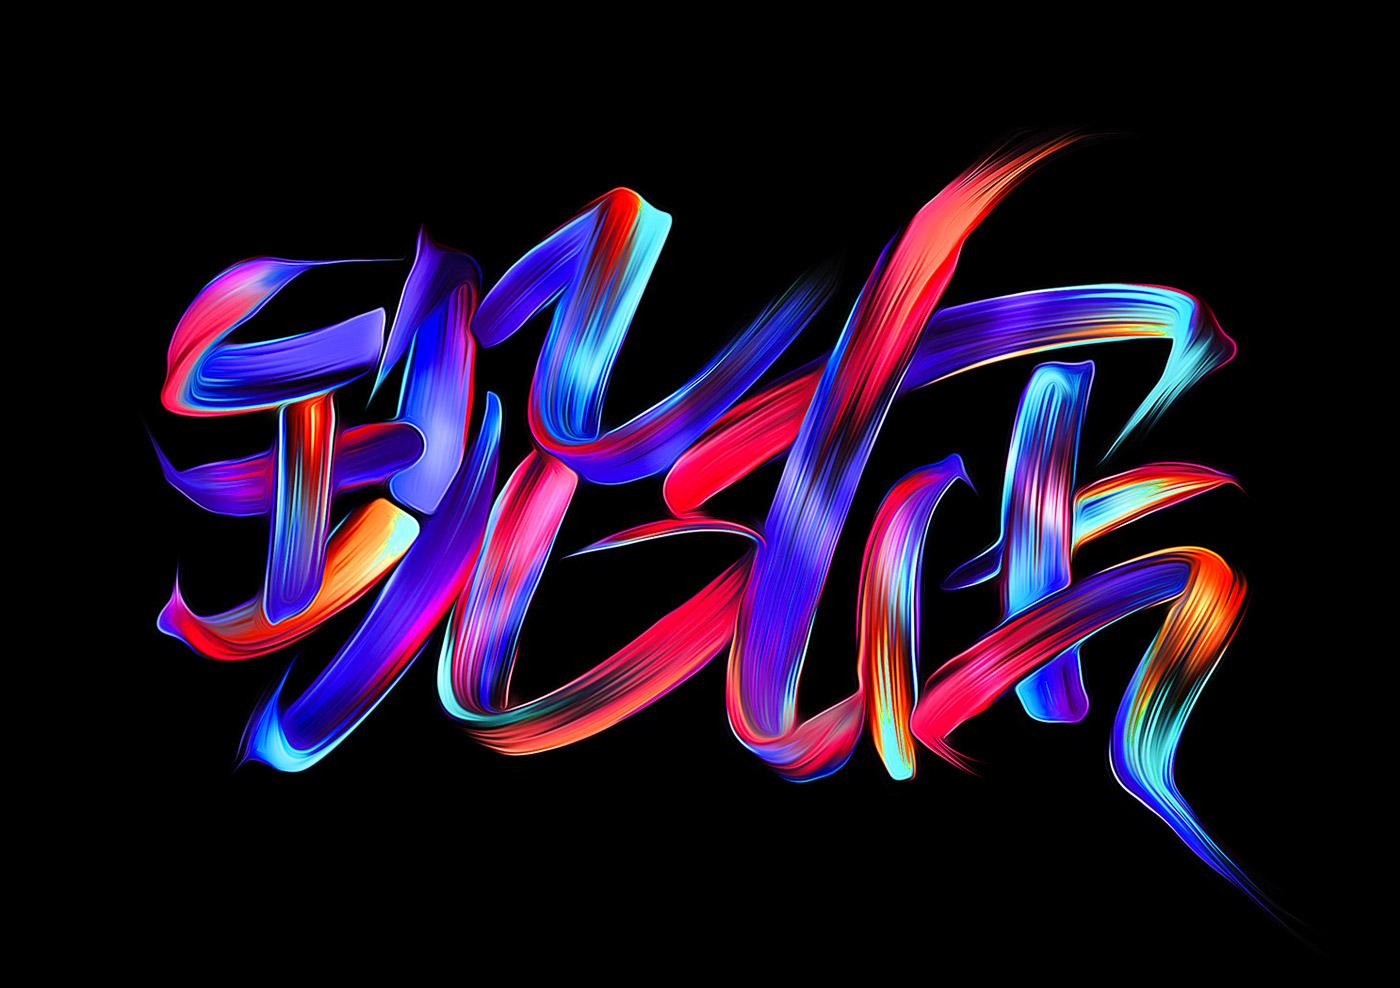 3d typography design ideas